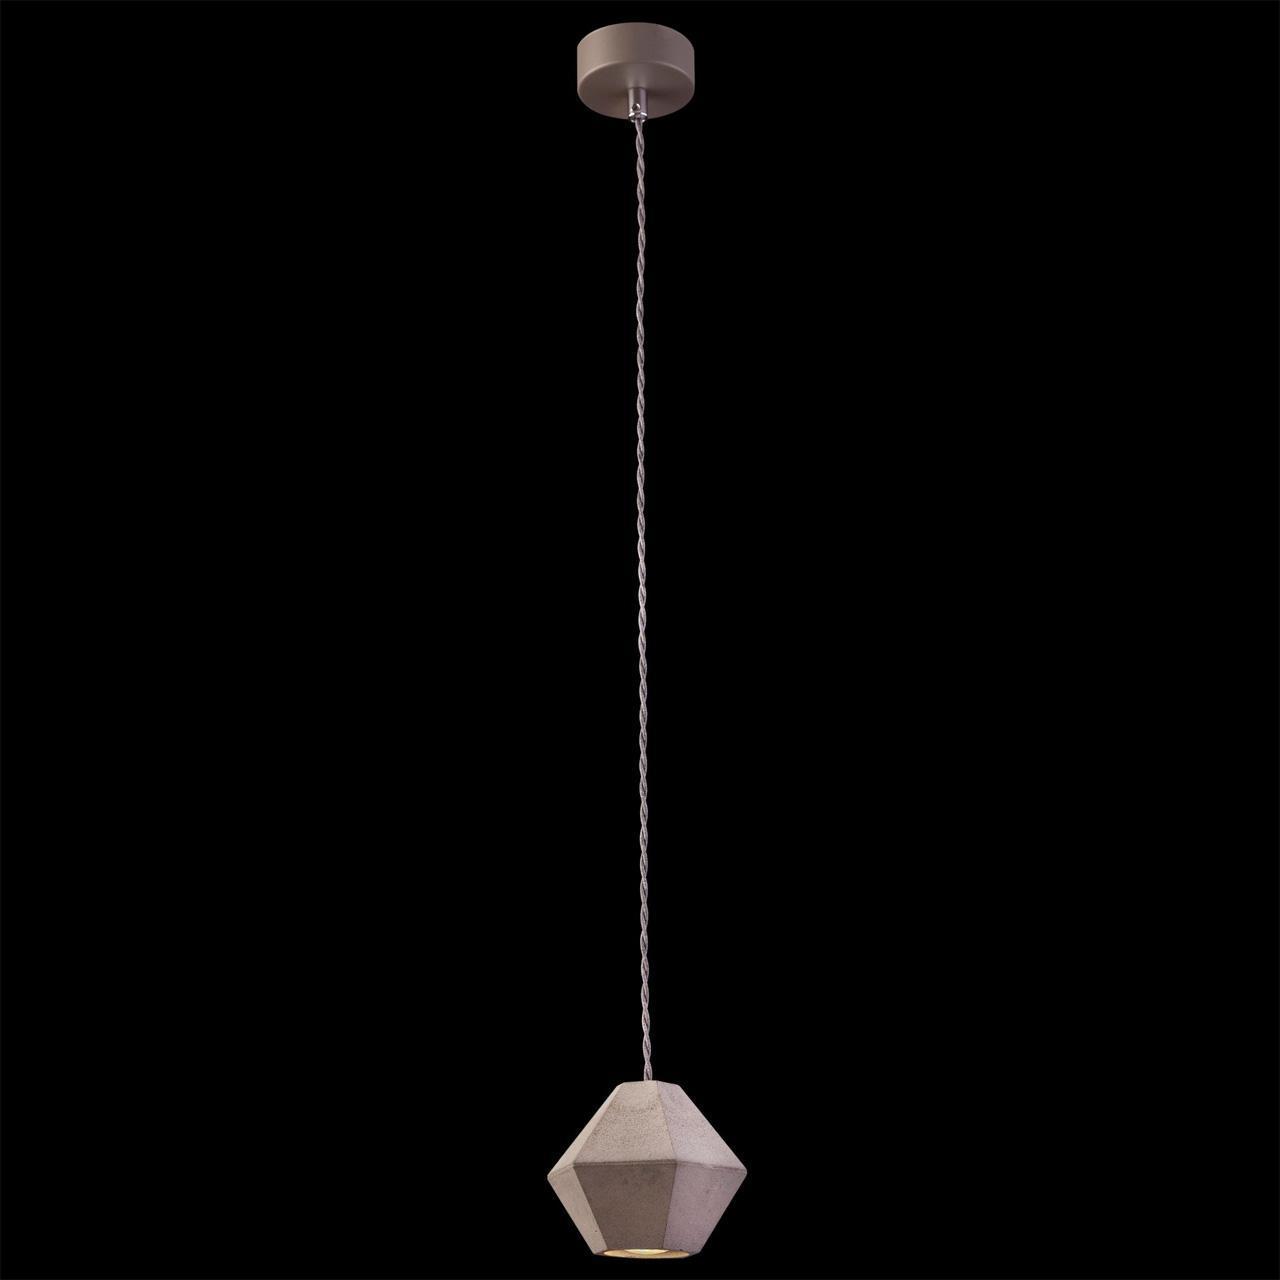 Подвесной светильник Nowodvorski Geometric 9697 delicate noctilucence hollow out geometric shape pendant necklace